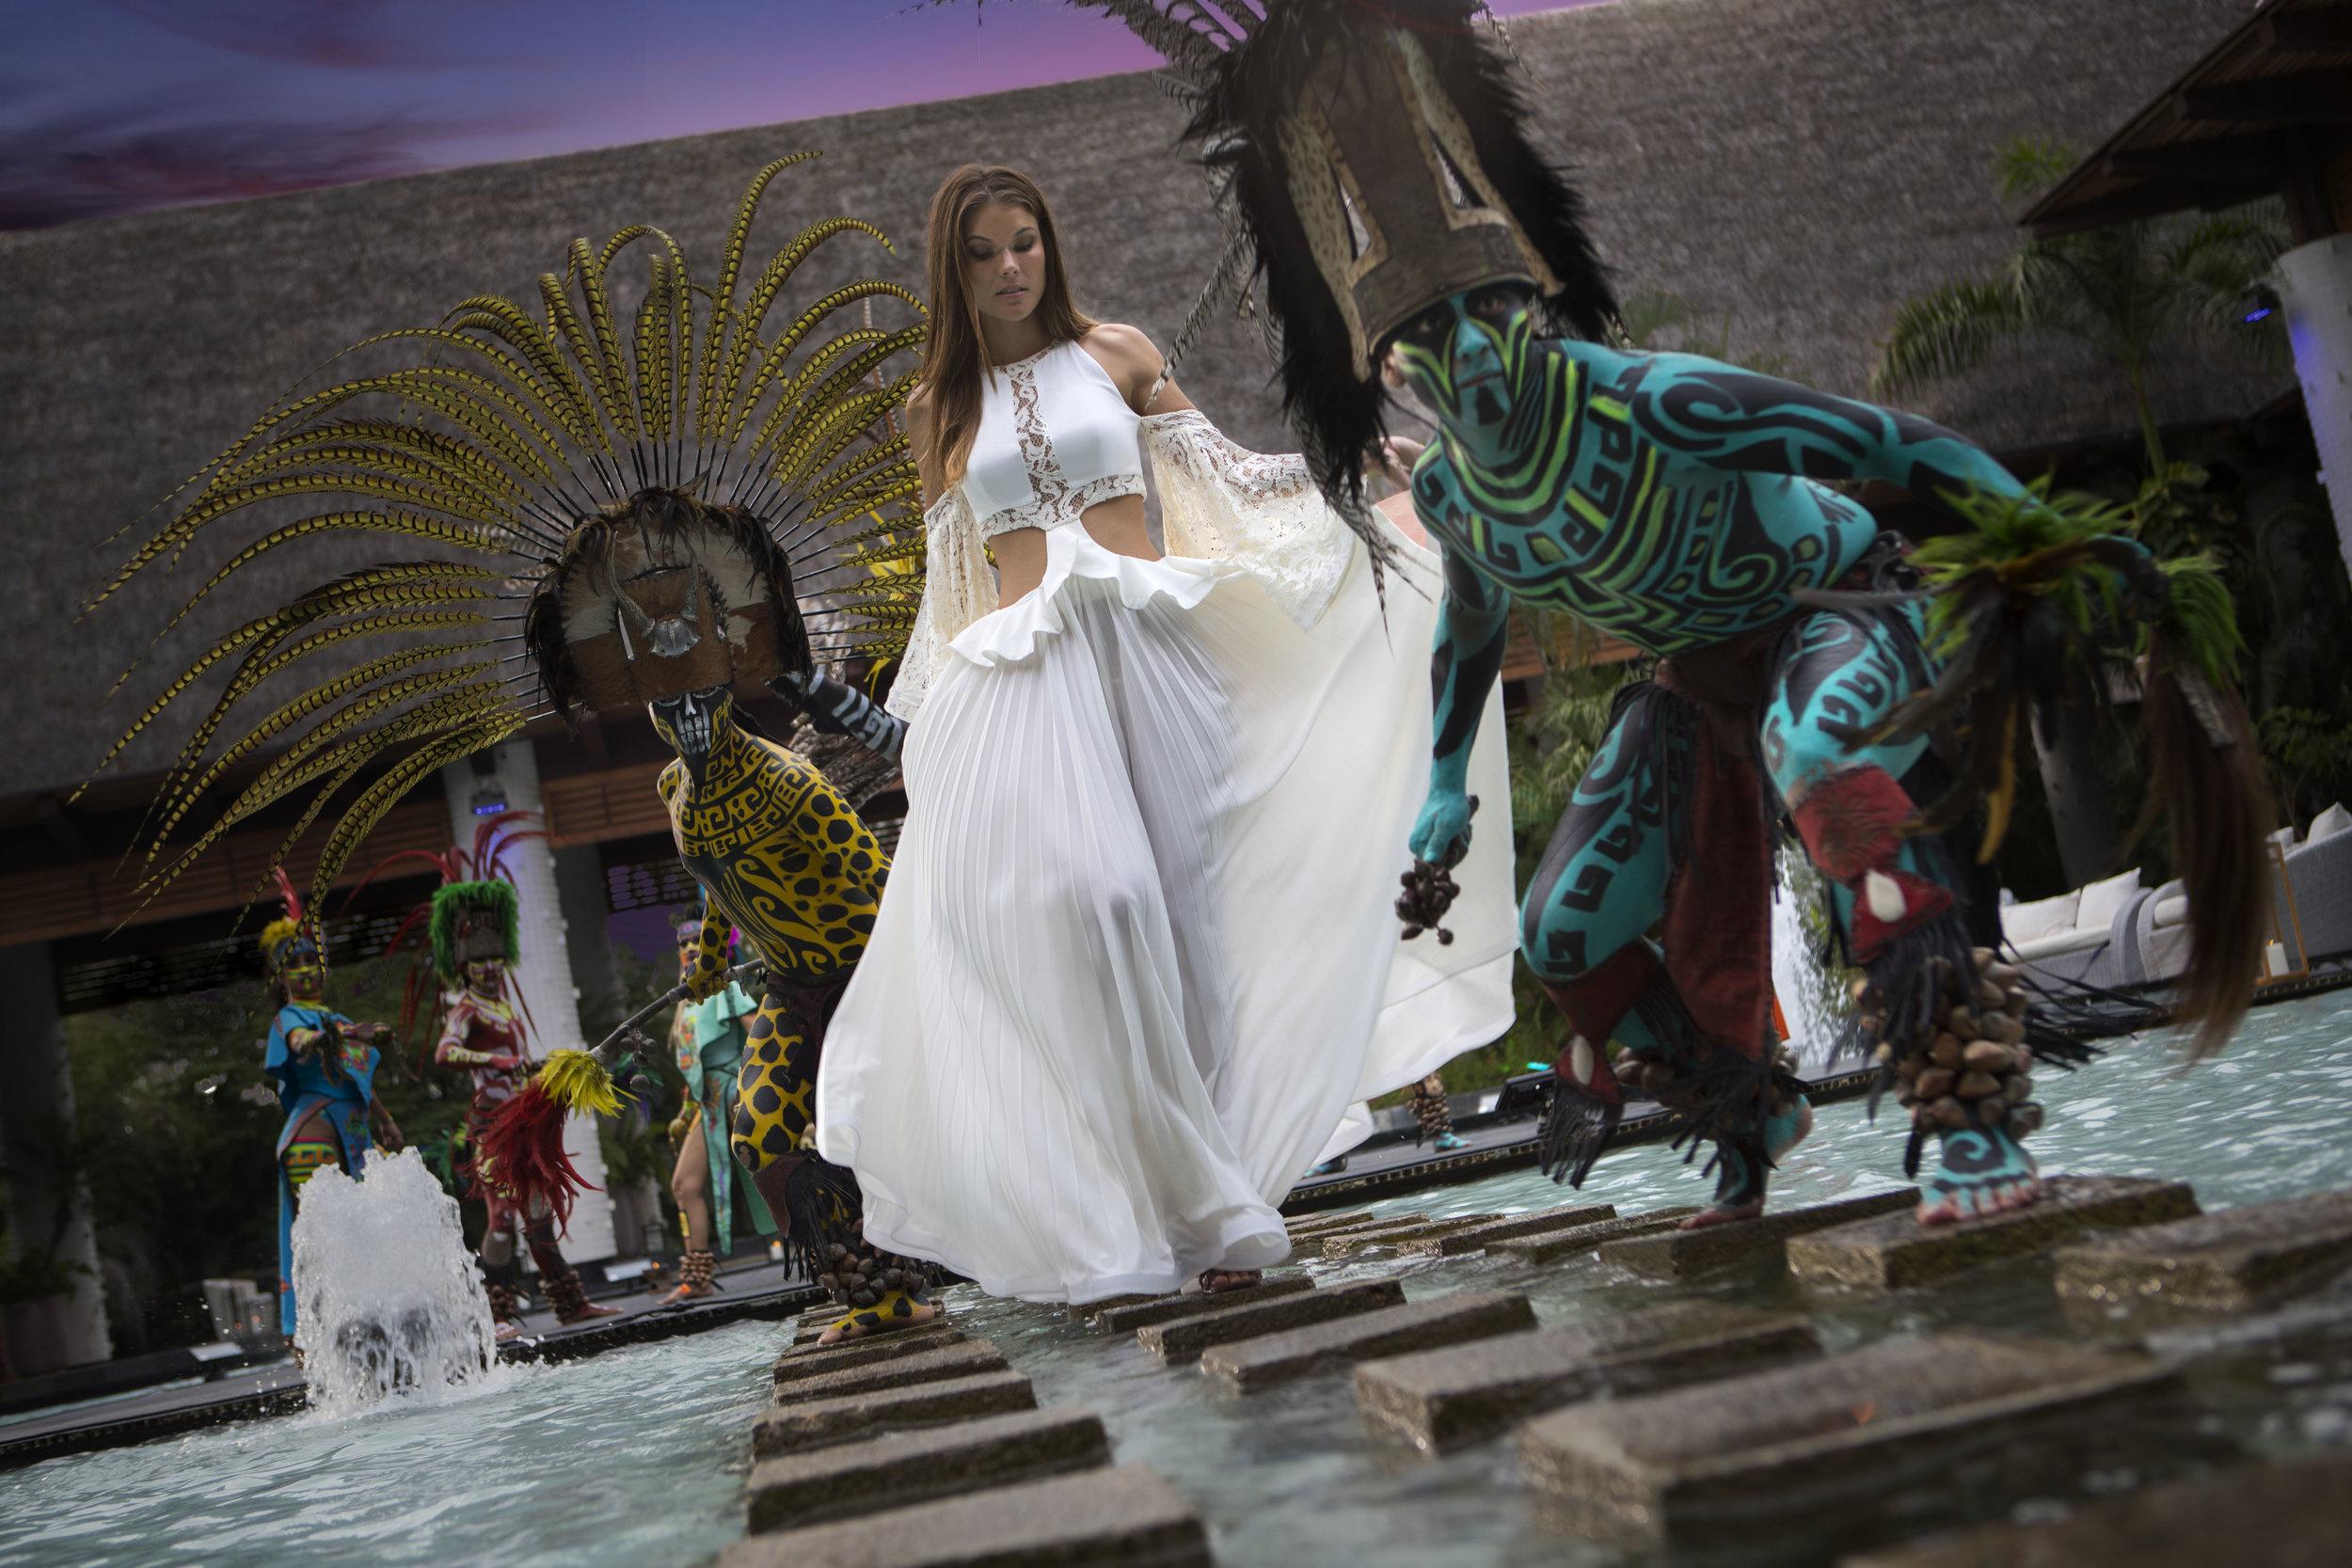 VID_NV_Woman_Santuario_MexPerformers.jpg